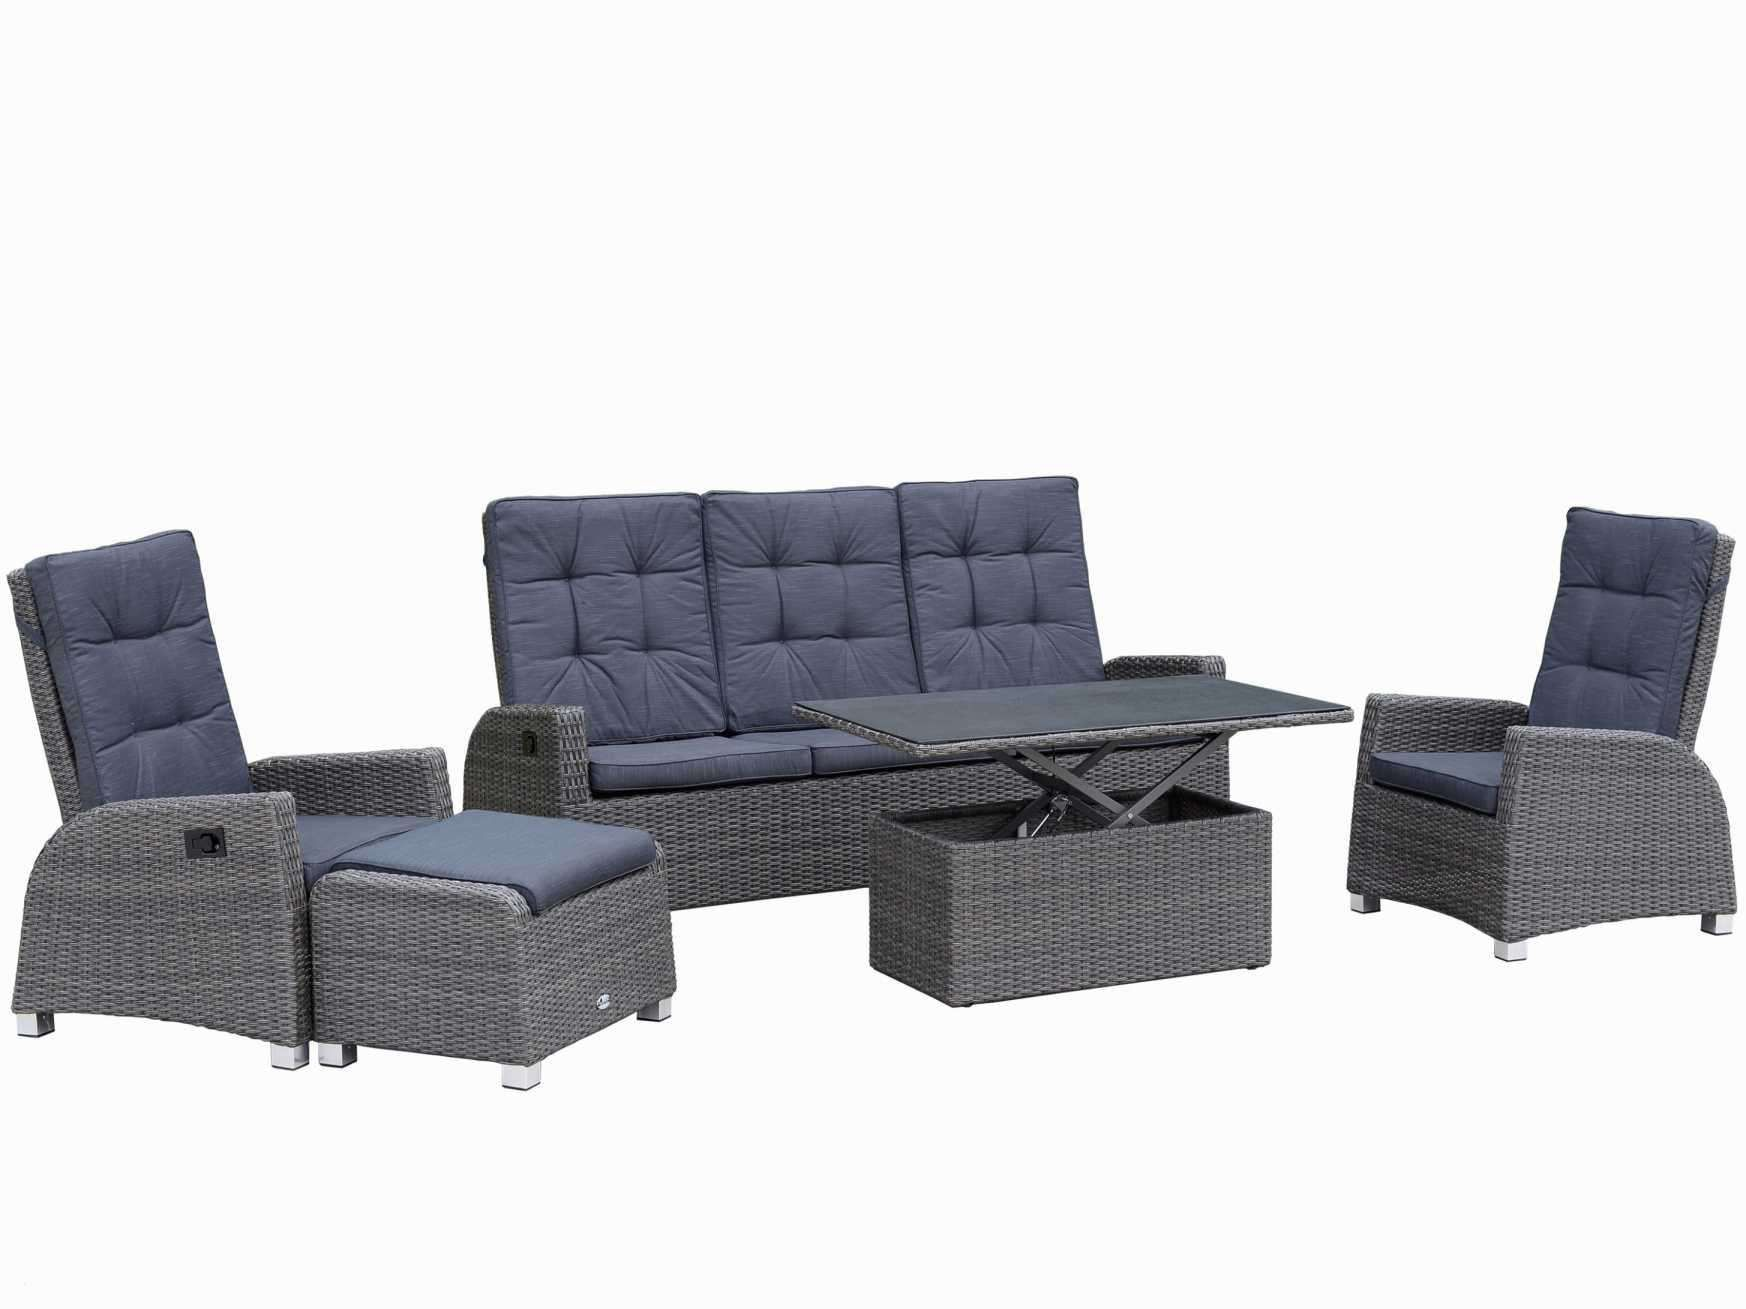 Design 40 Fur Solarleuchte Kugel Aldi Check More At Https Www Estadoproperties Com Solarleuchte Aussenmobel Gartenmobel Lounge Set Big Sofa Mit Schlaffunktion